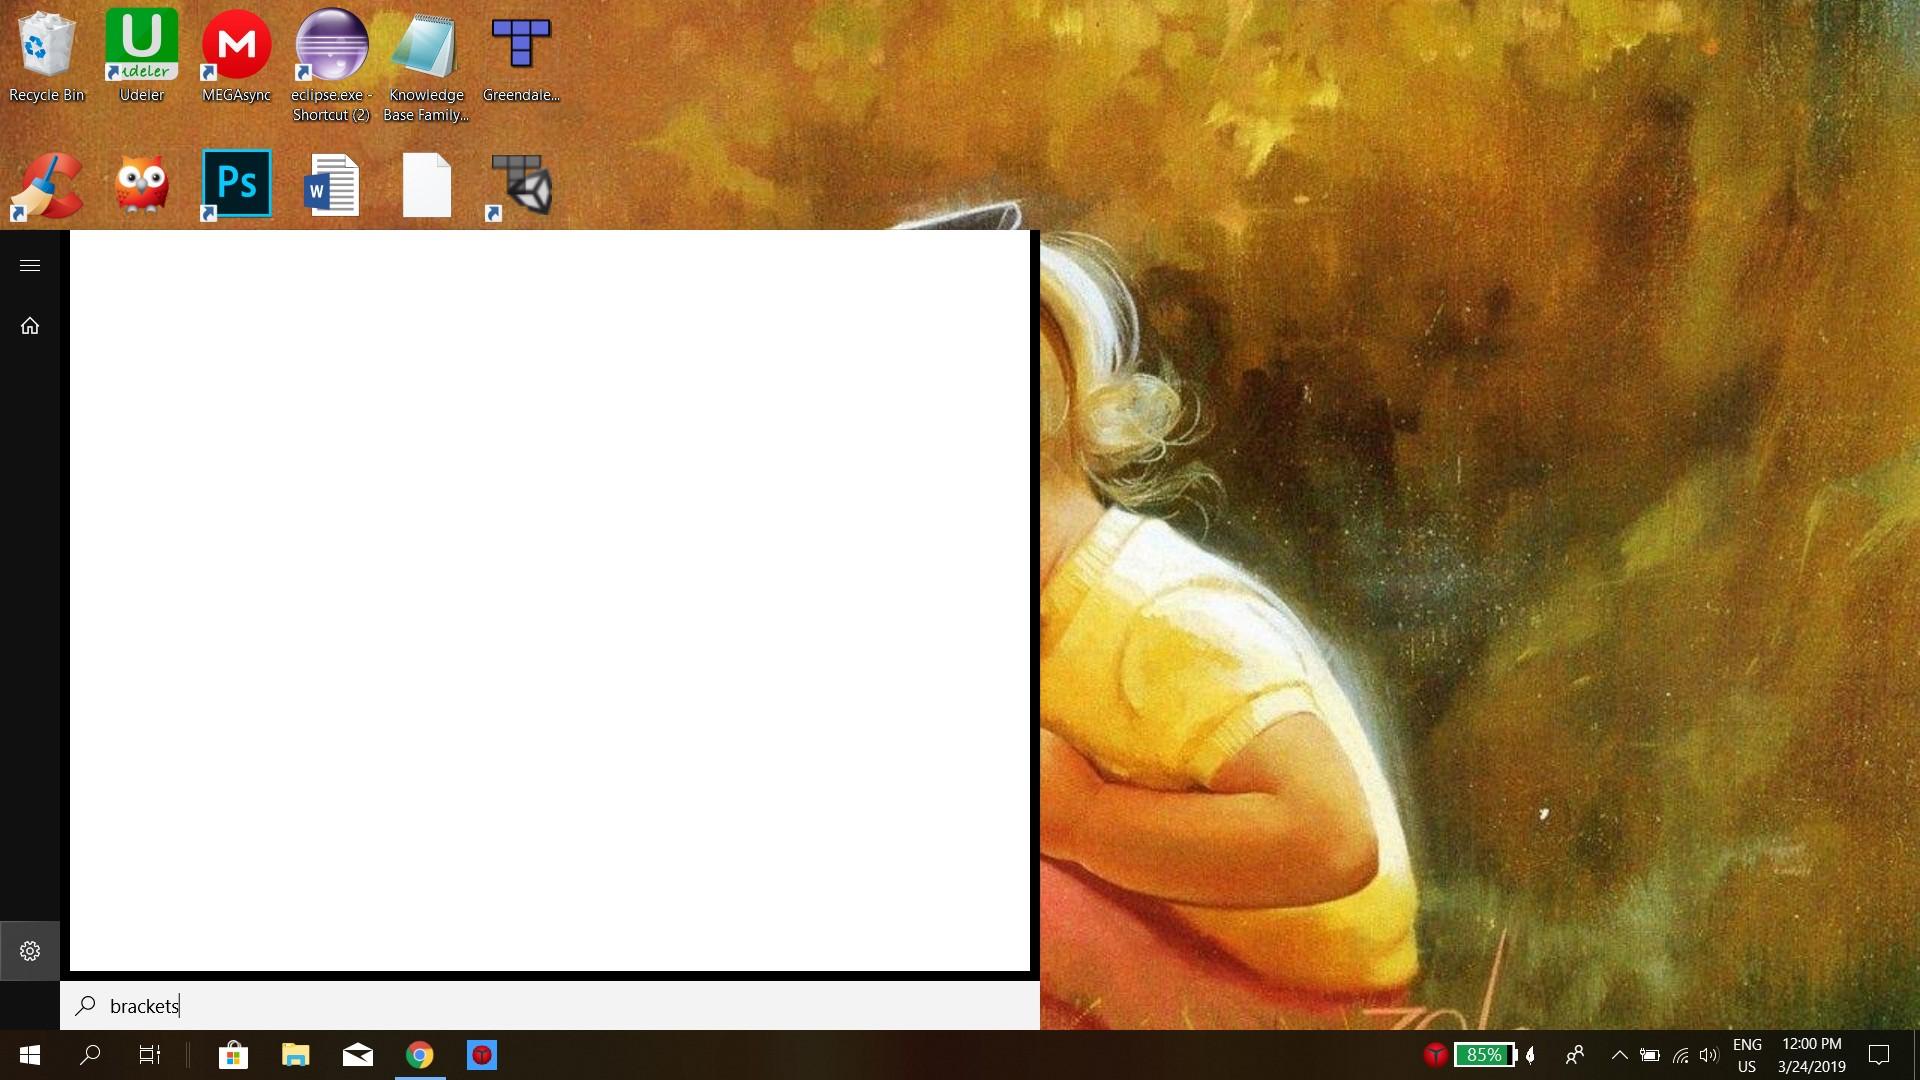 Windows search popup a whitebox - Microsoft Community